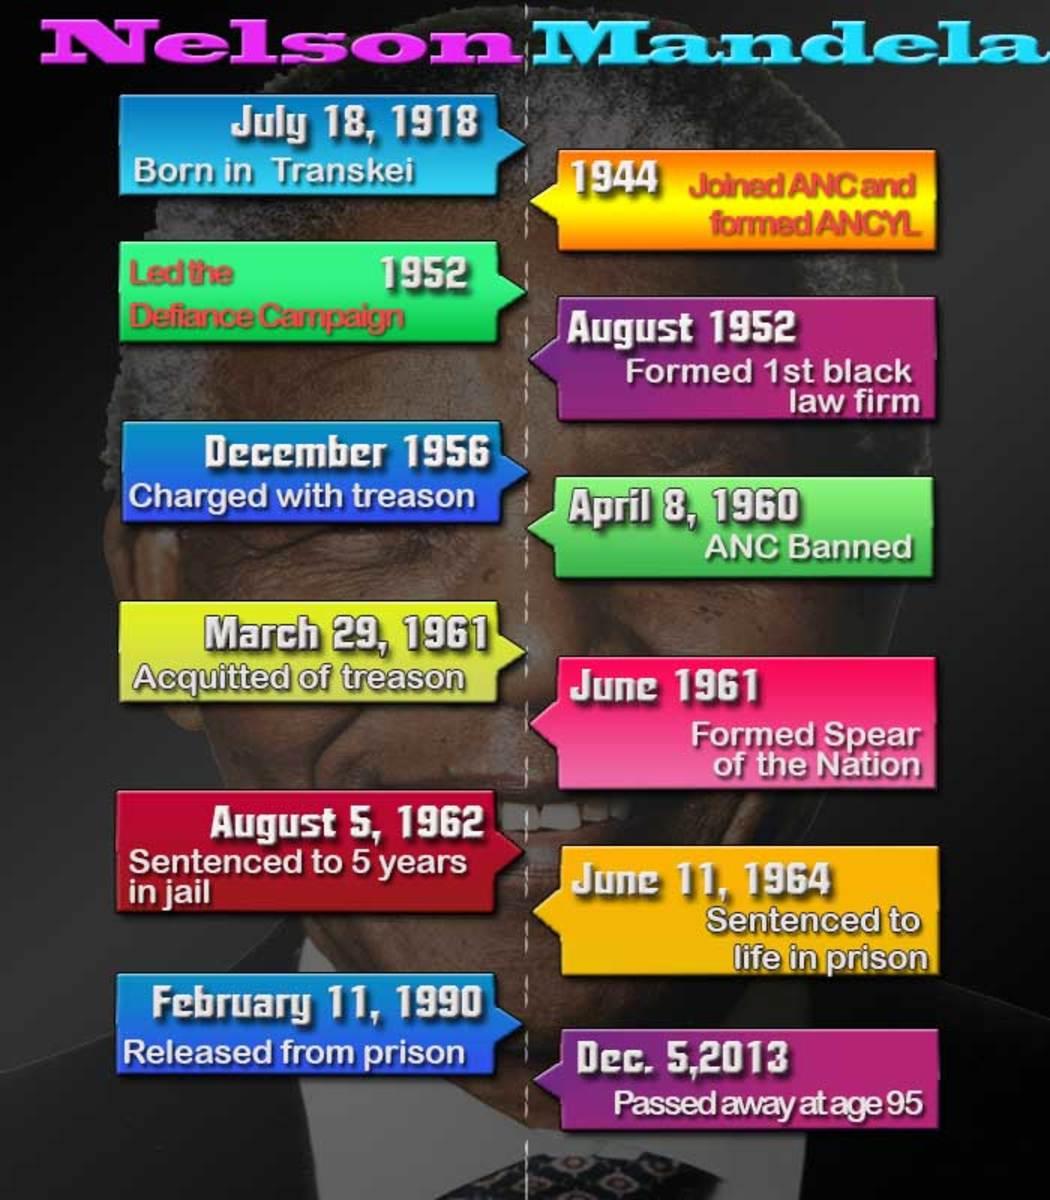 A timeline of major events in Nelson Mandela's life.